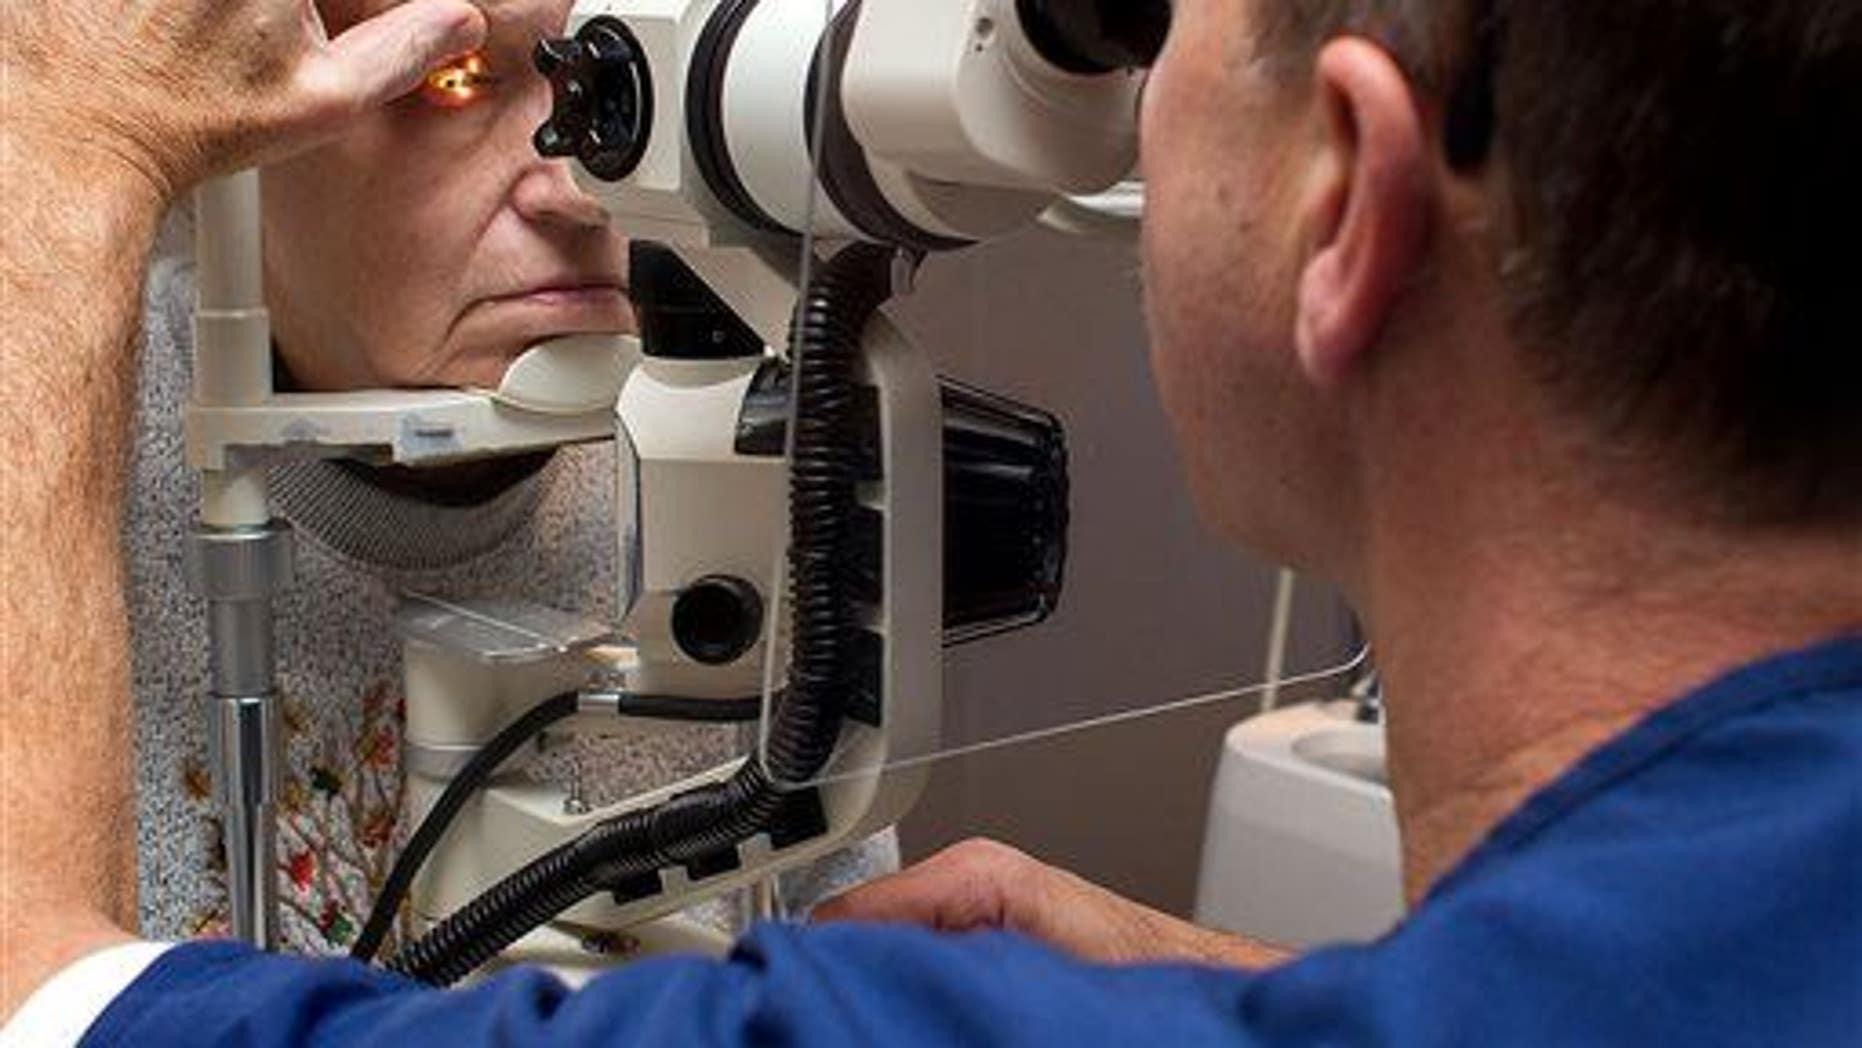 An eye exam in progress.